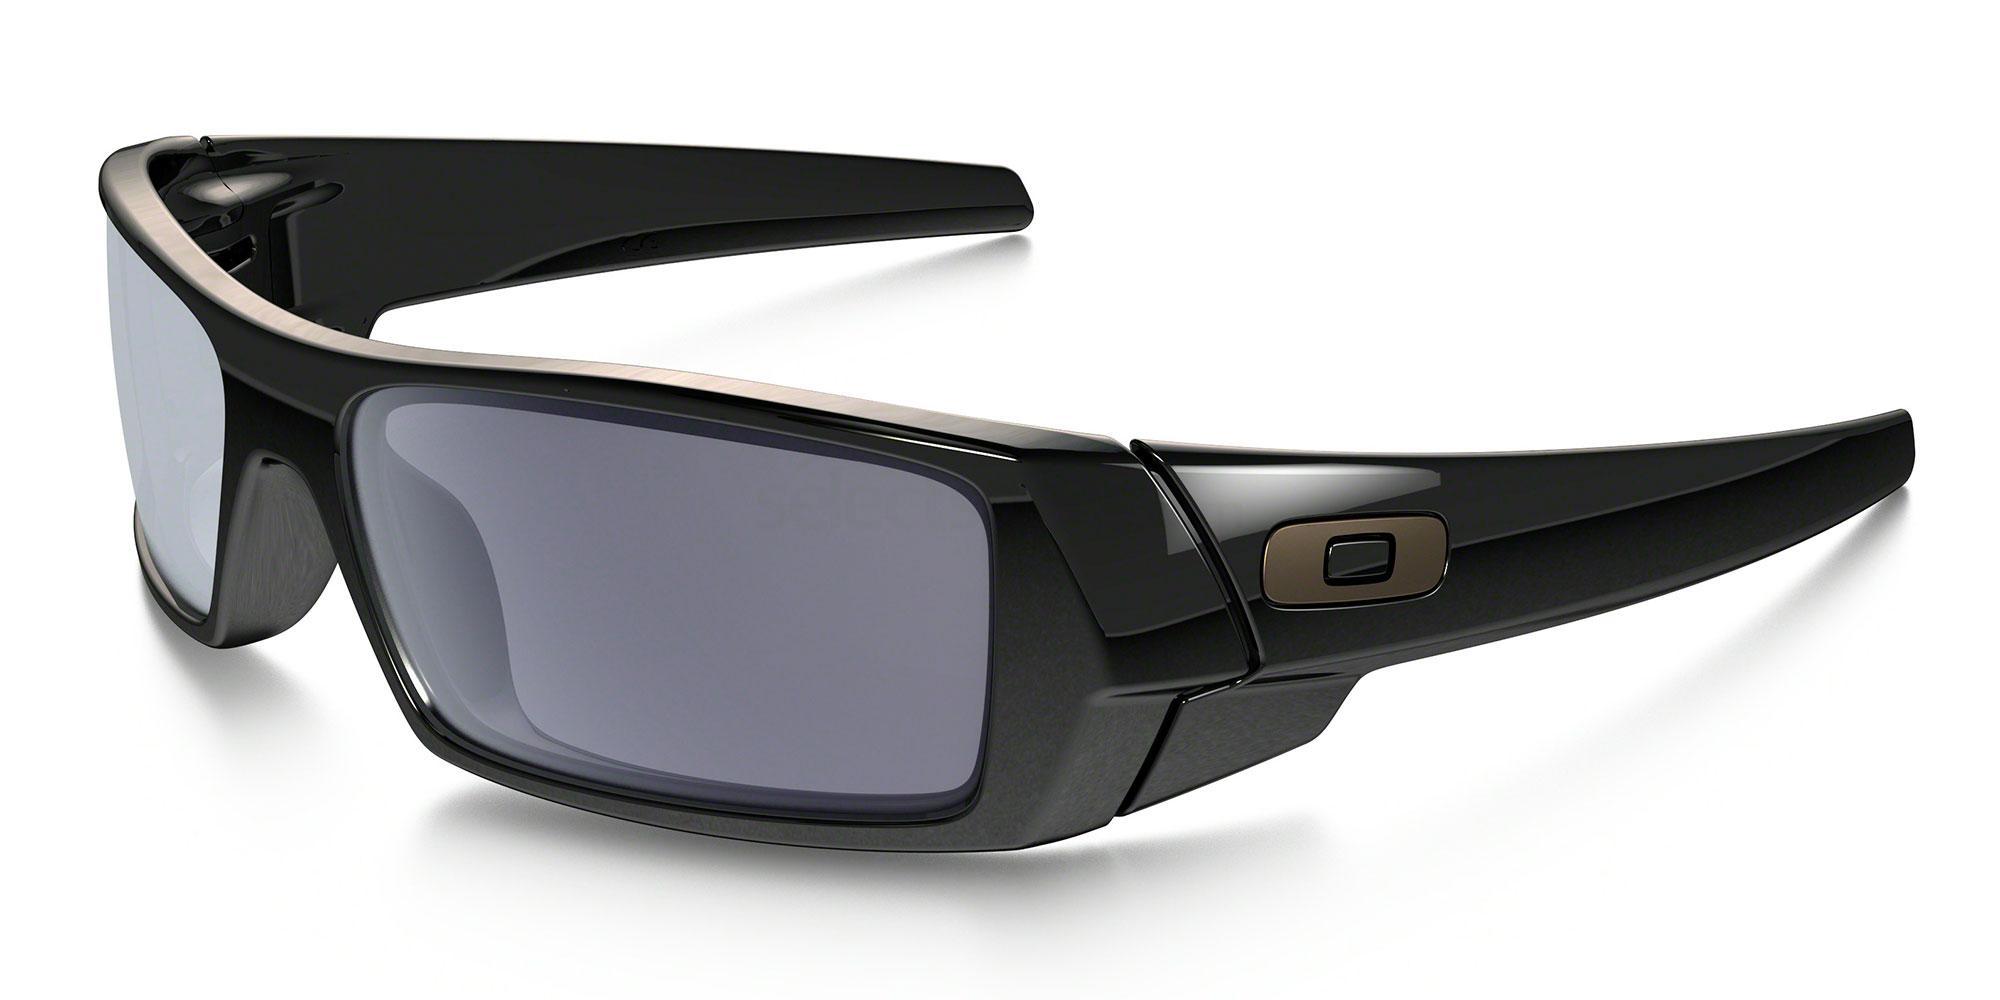 Oakley_OO9014_Gascan_sunglasses